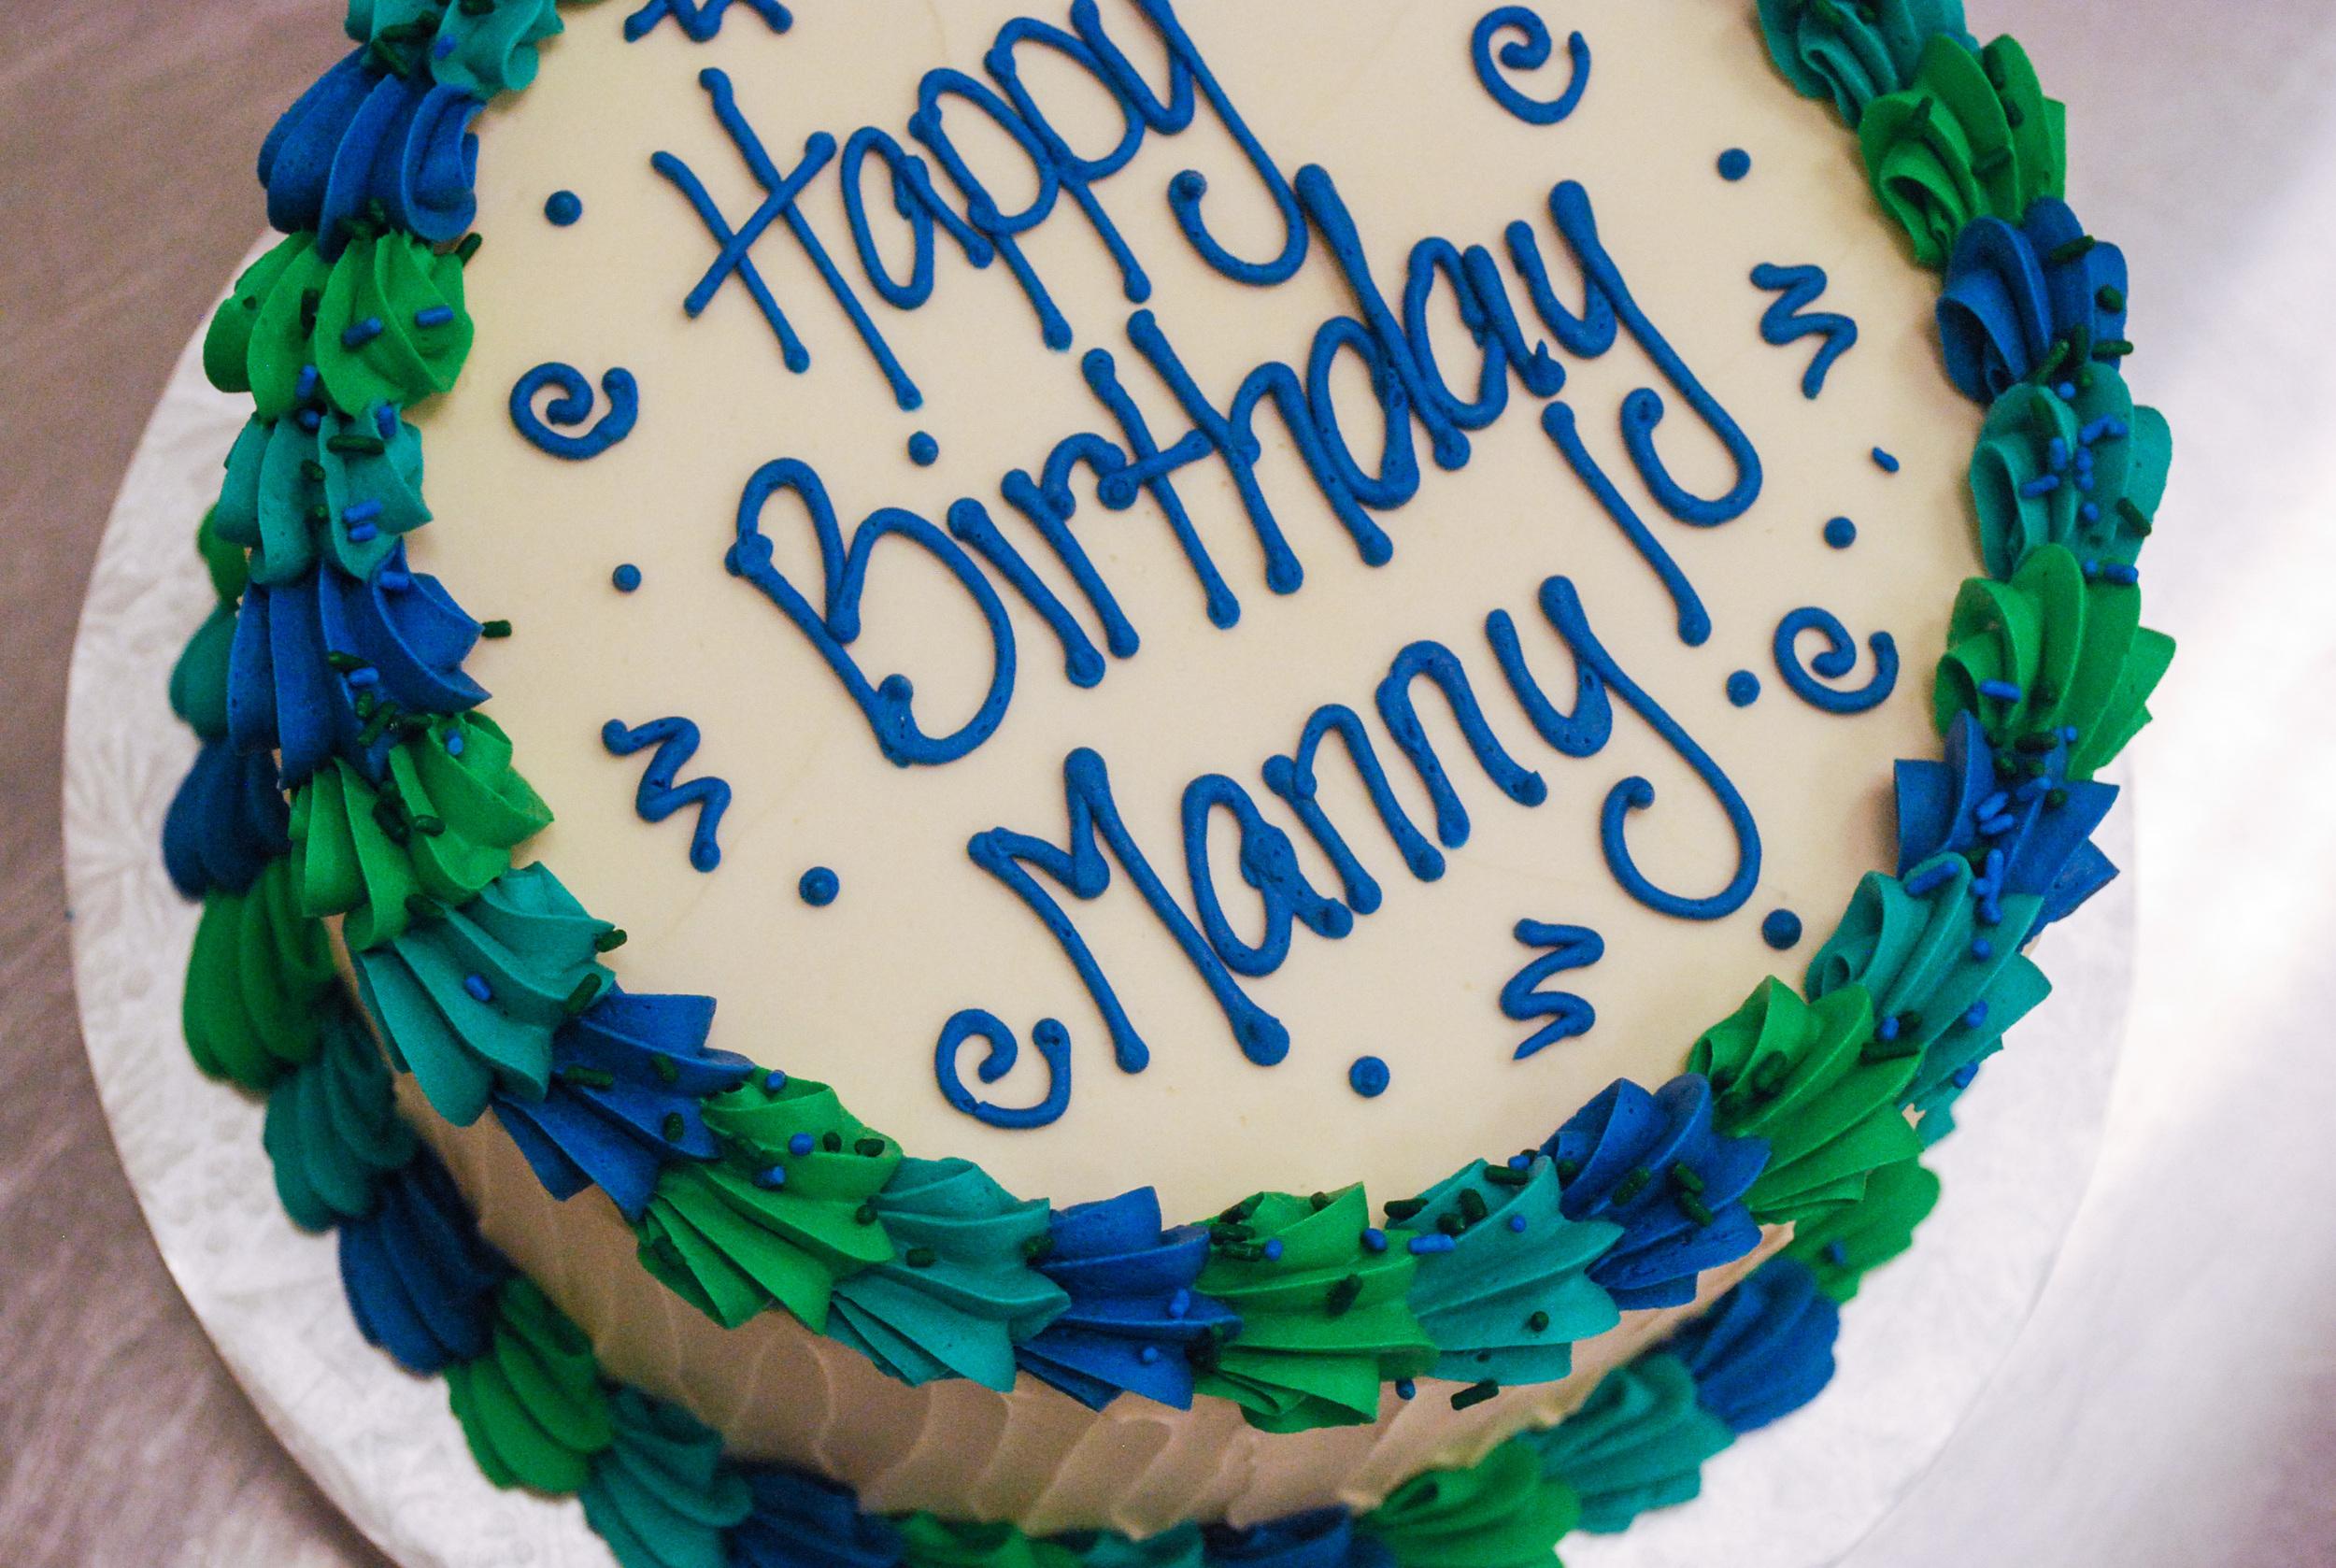 Decorated Cakes_6.jpg